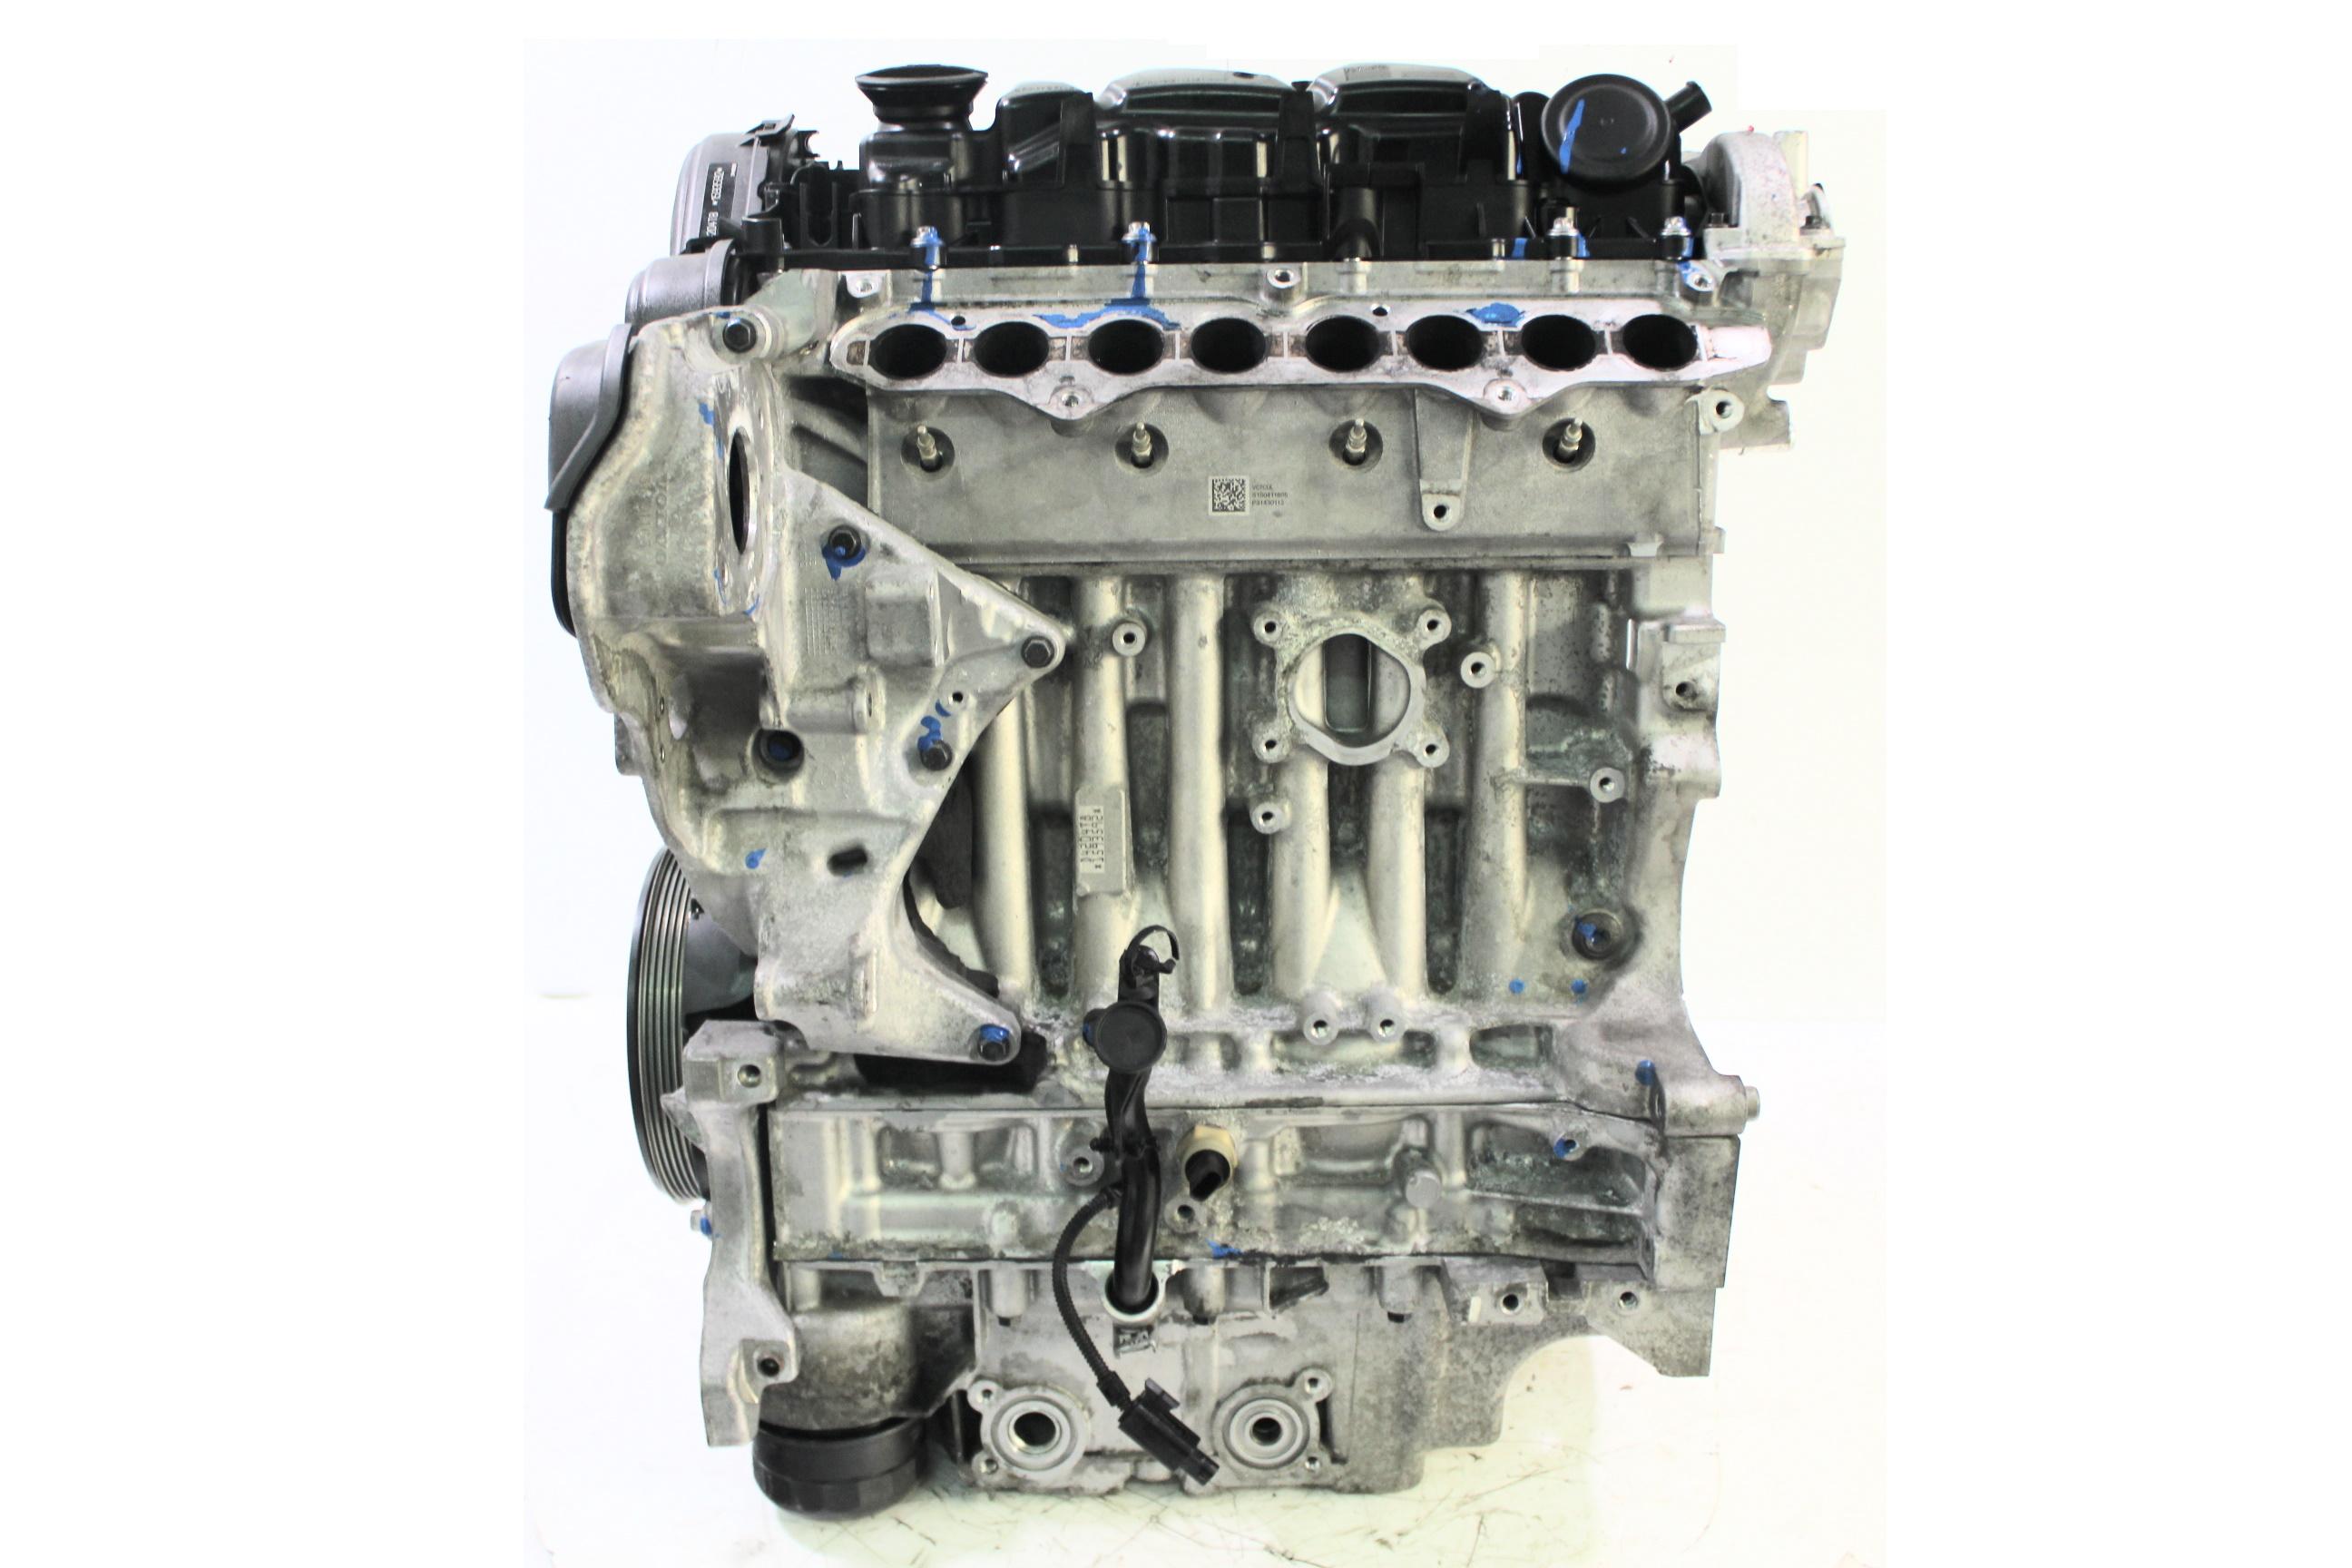 Motor 2016 Volvo S60 V40 V60 2,0 D2 Diesel D4204T8 120 PS